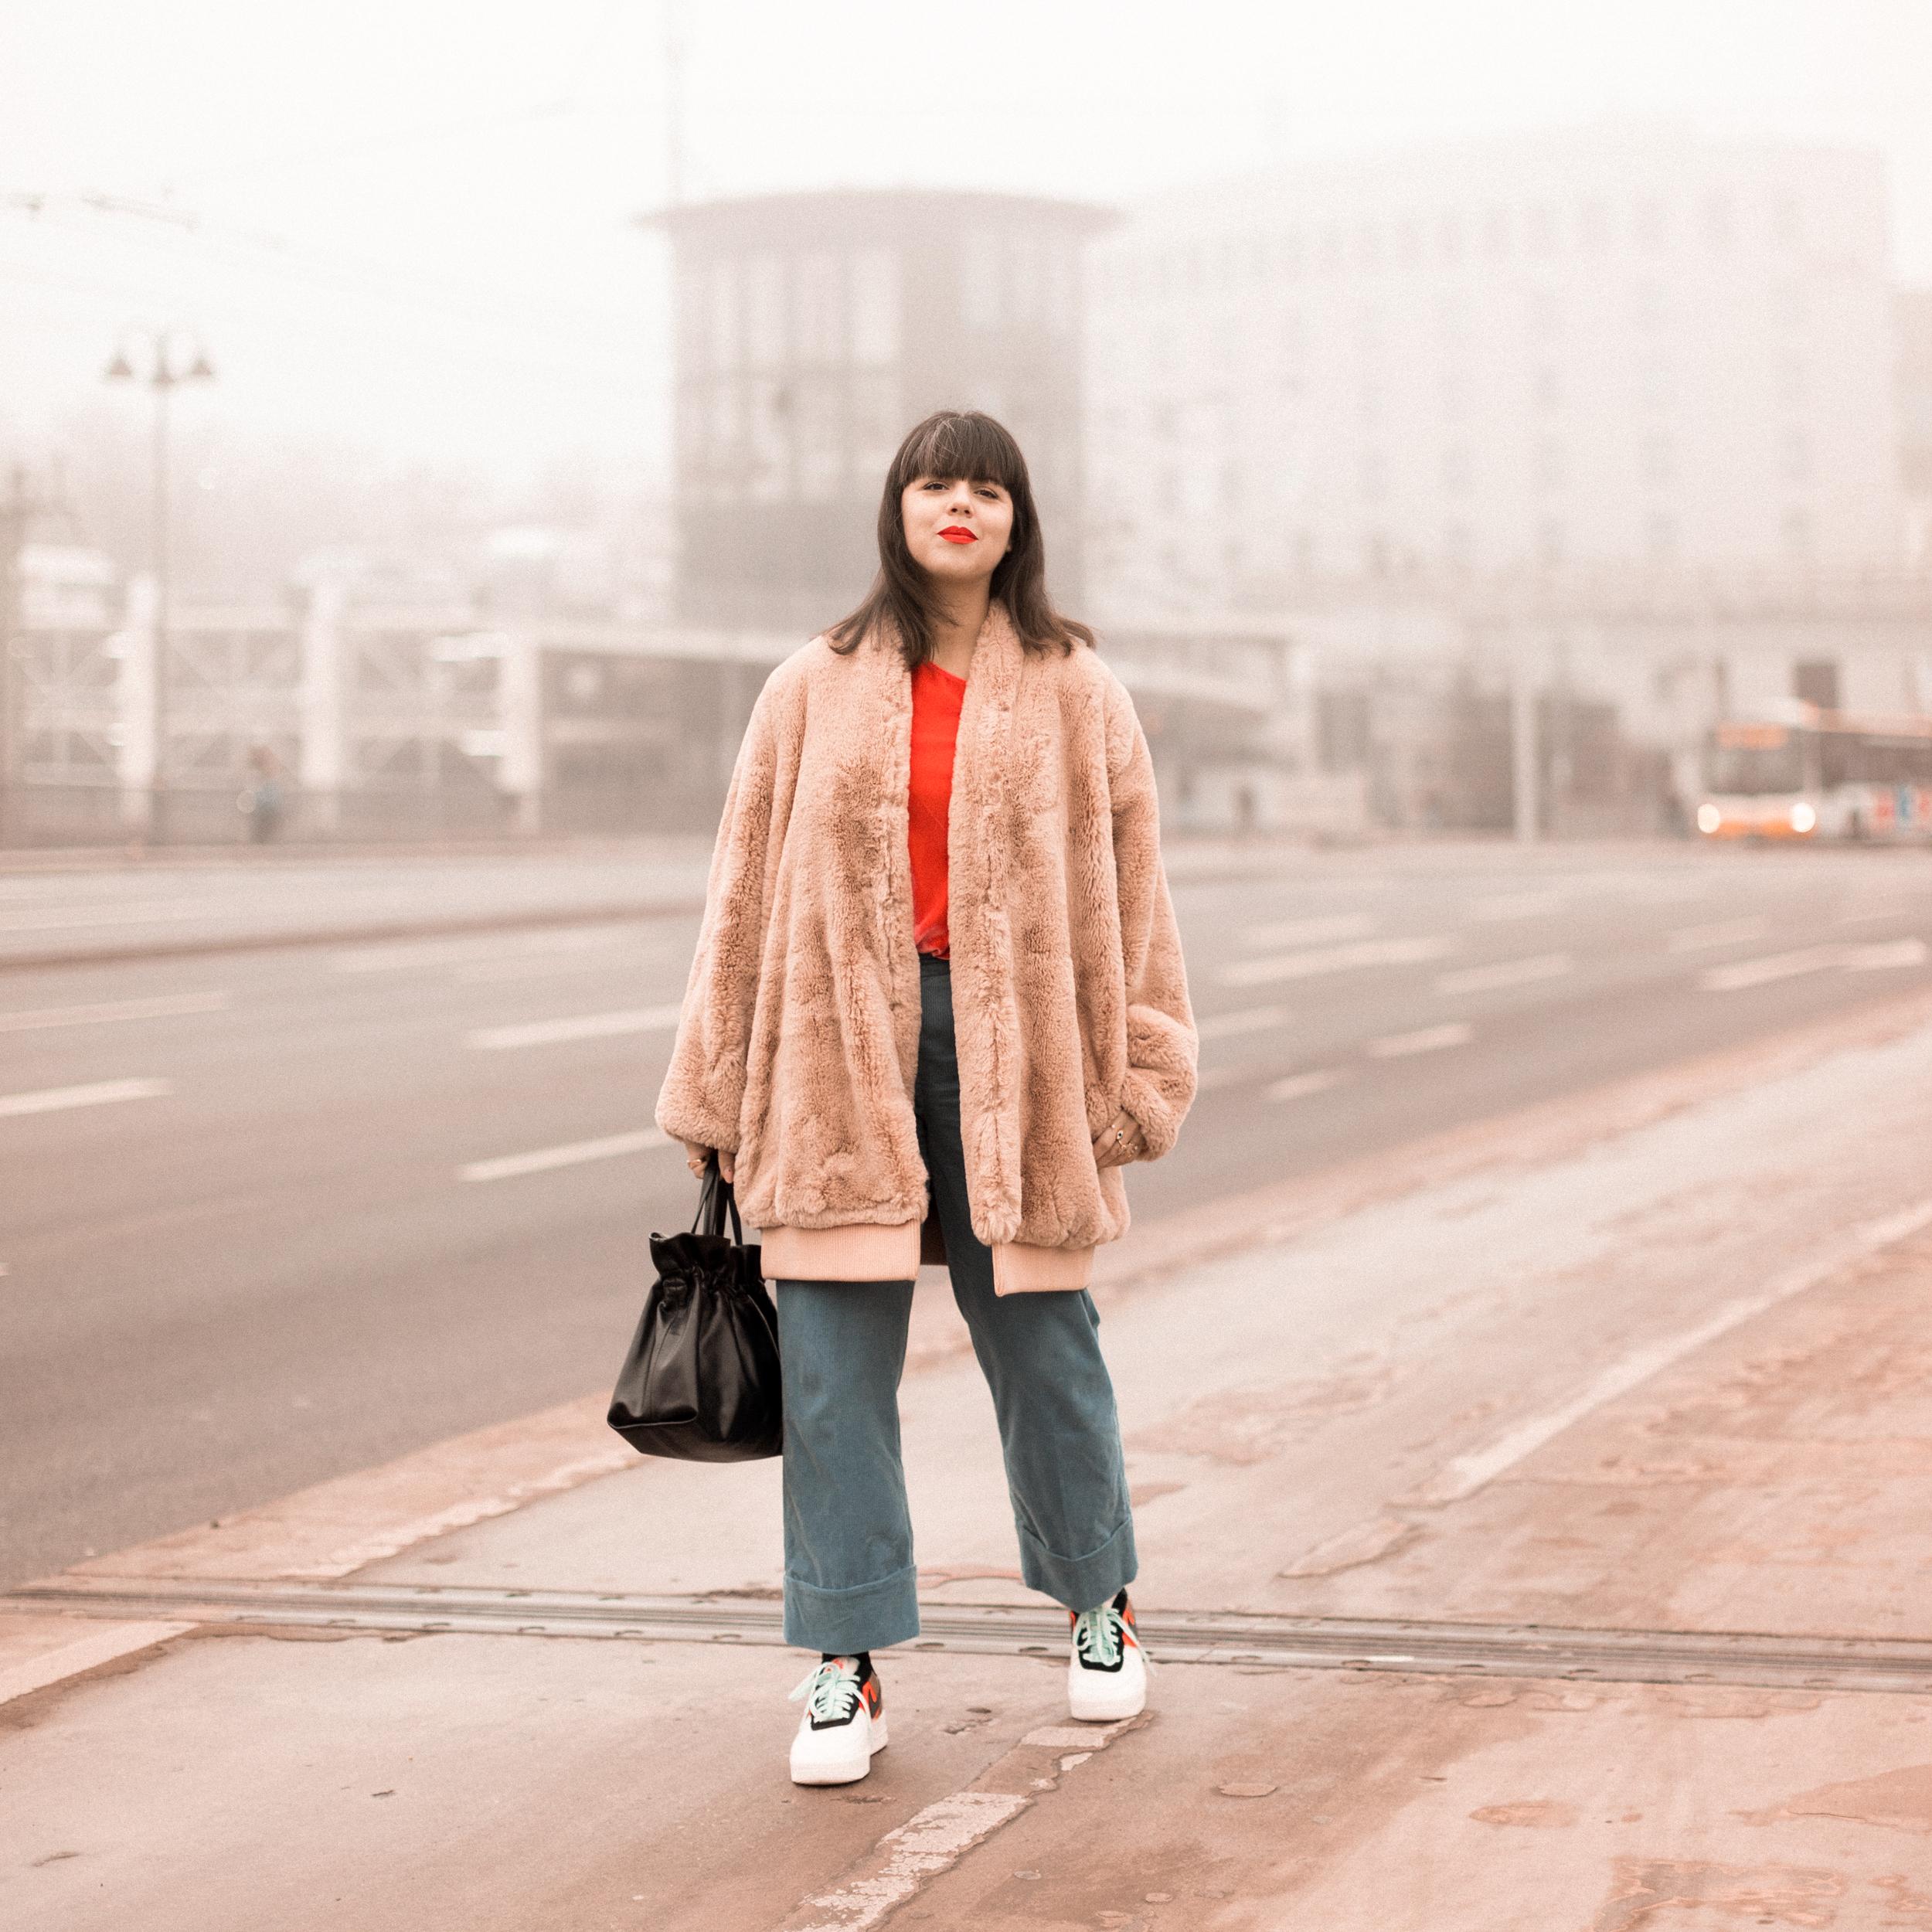 Pauline - Blog mode, voyages, photo